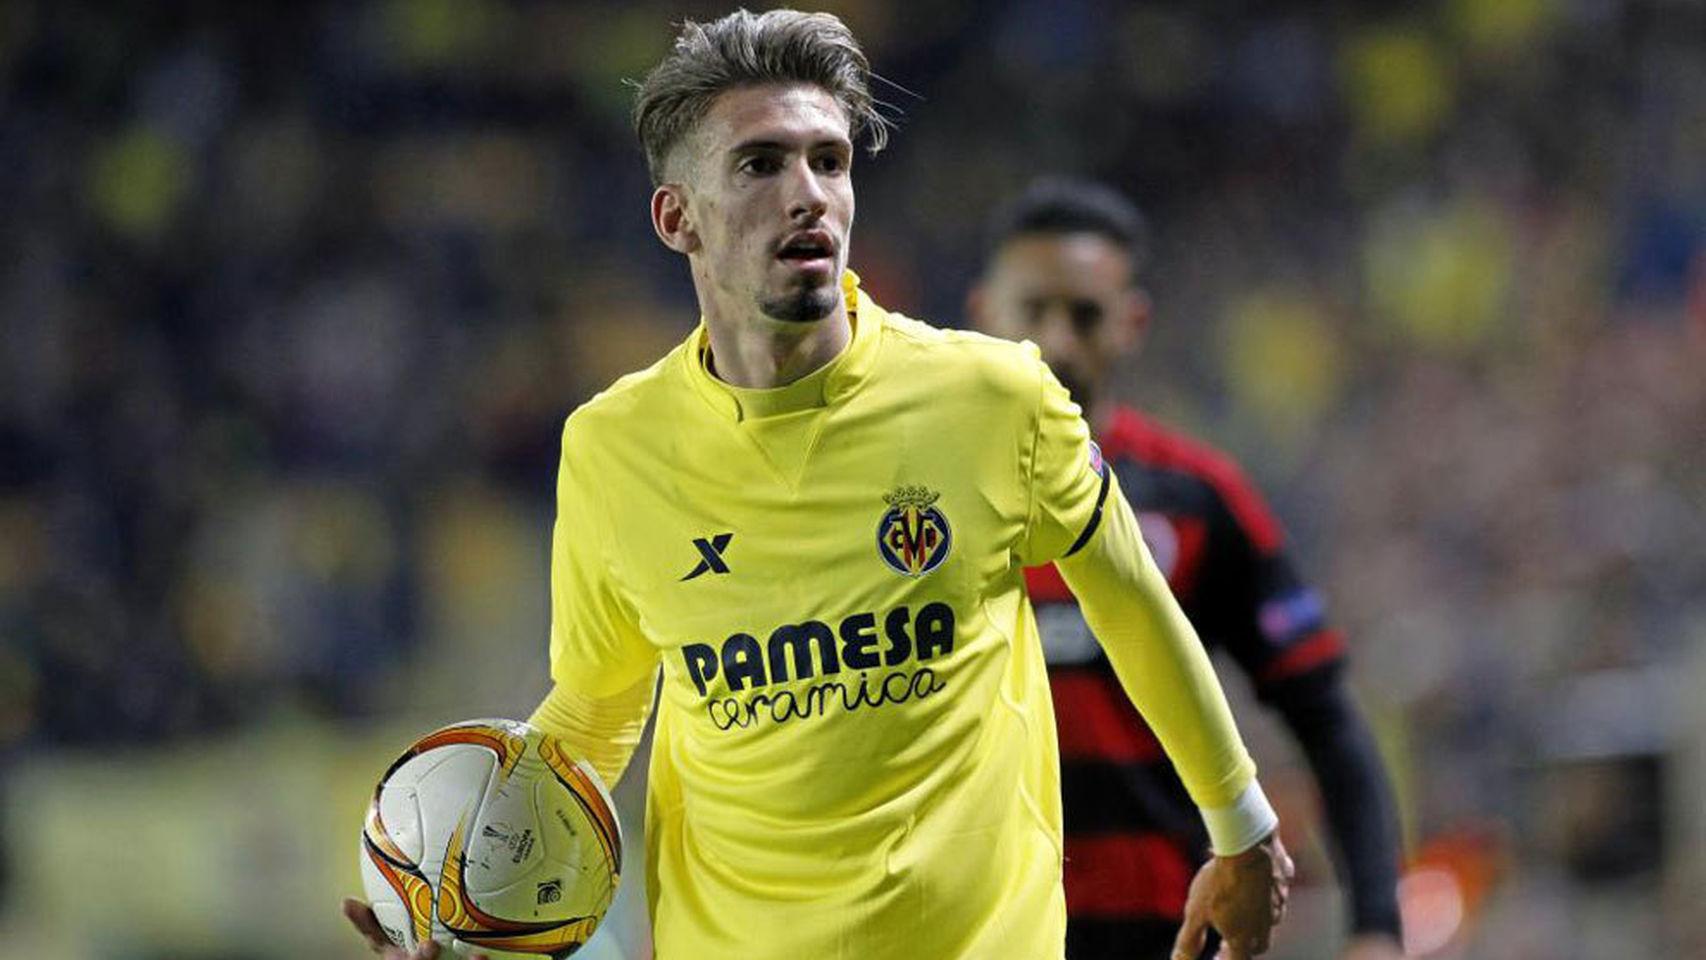 Eibar-Villarreal mercoledì 28 febbraio, analisi e pronostico LaLiga giornata 26